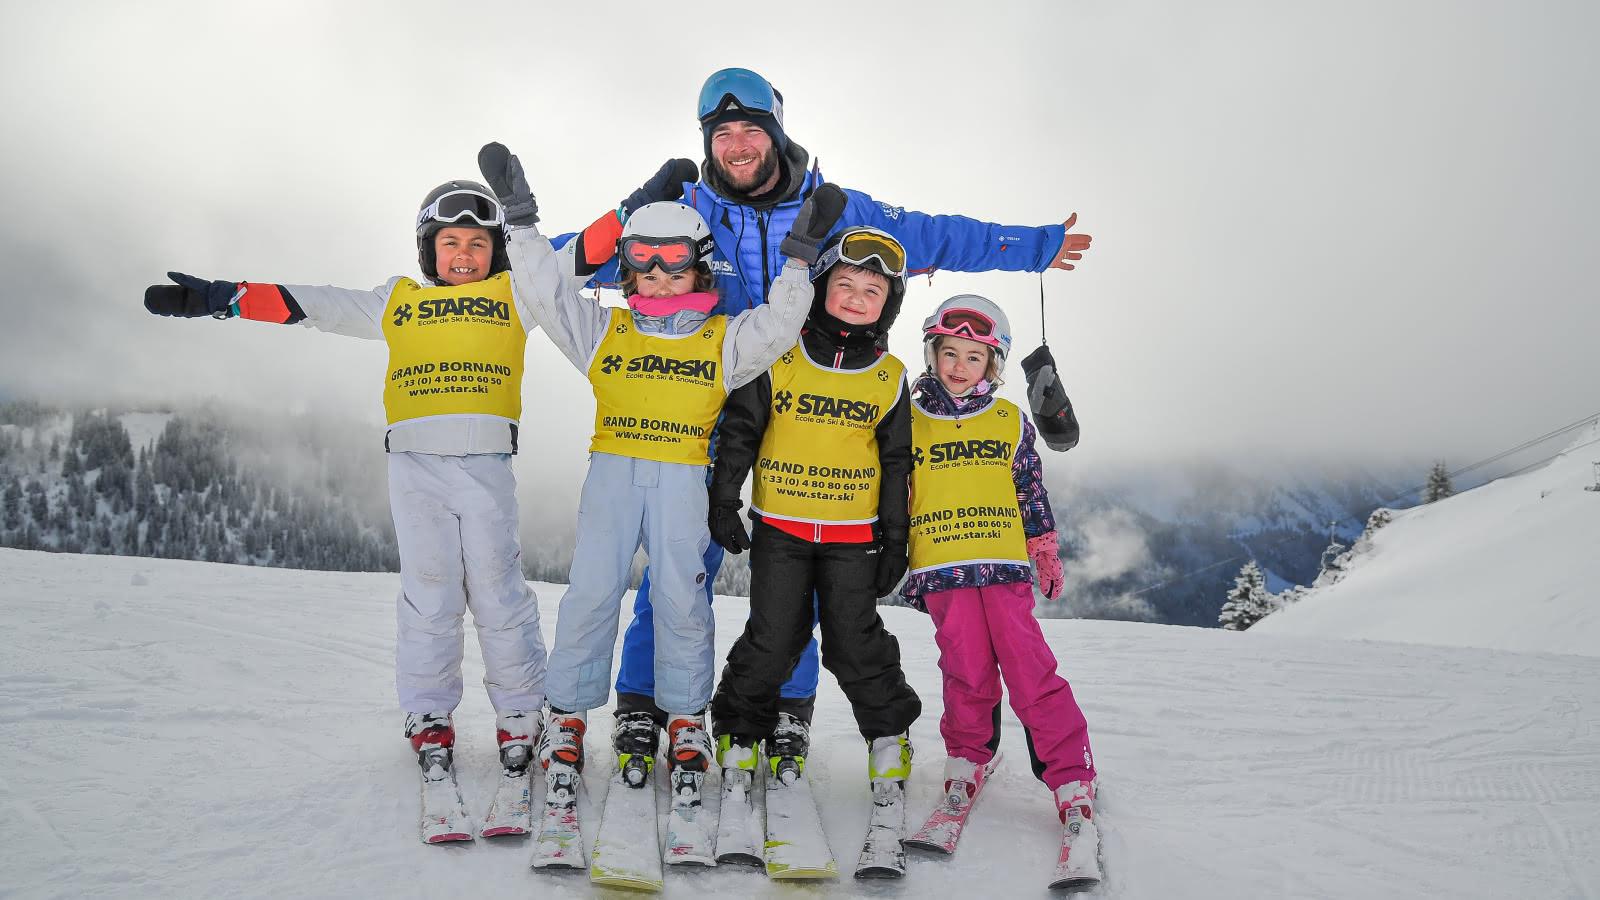 Cours de ski en petit groupe avec Starski